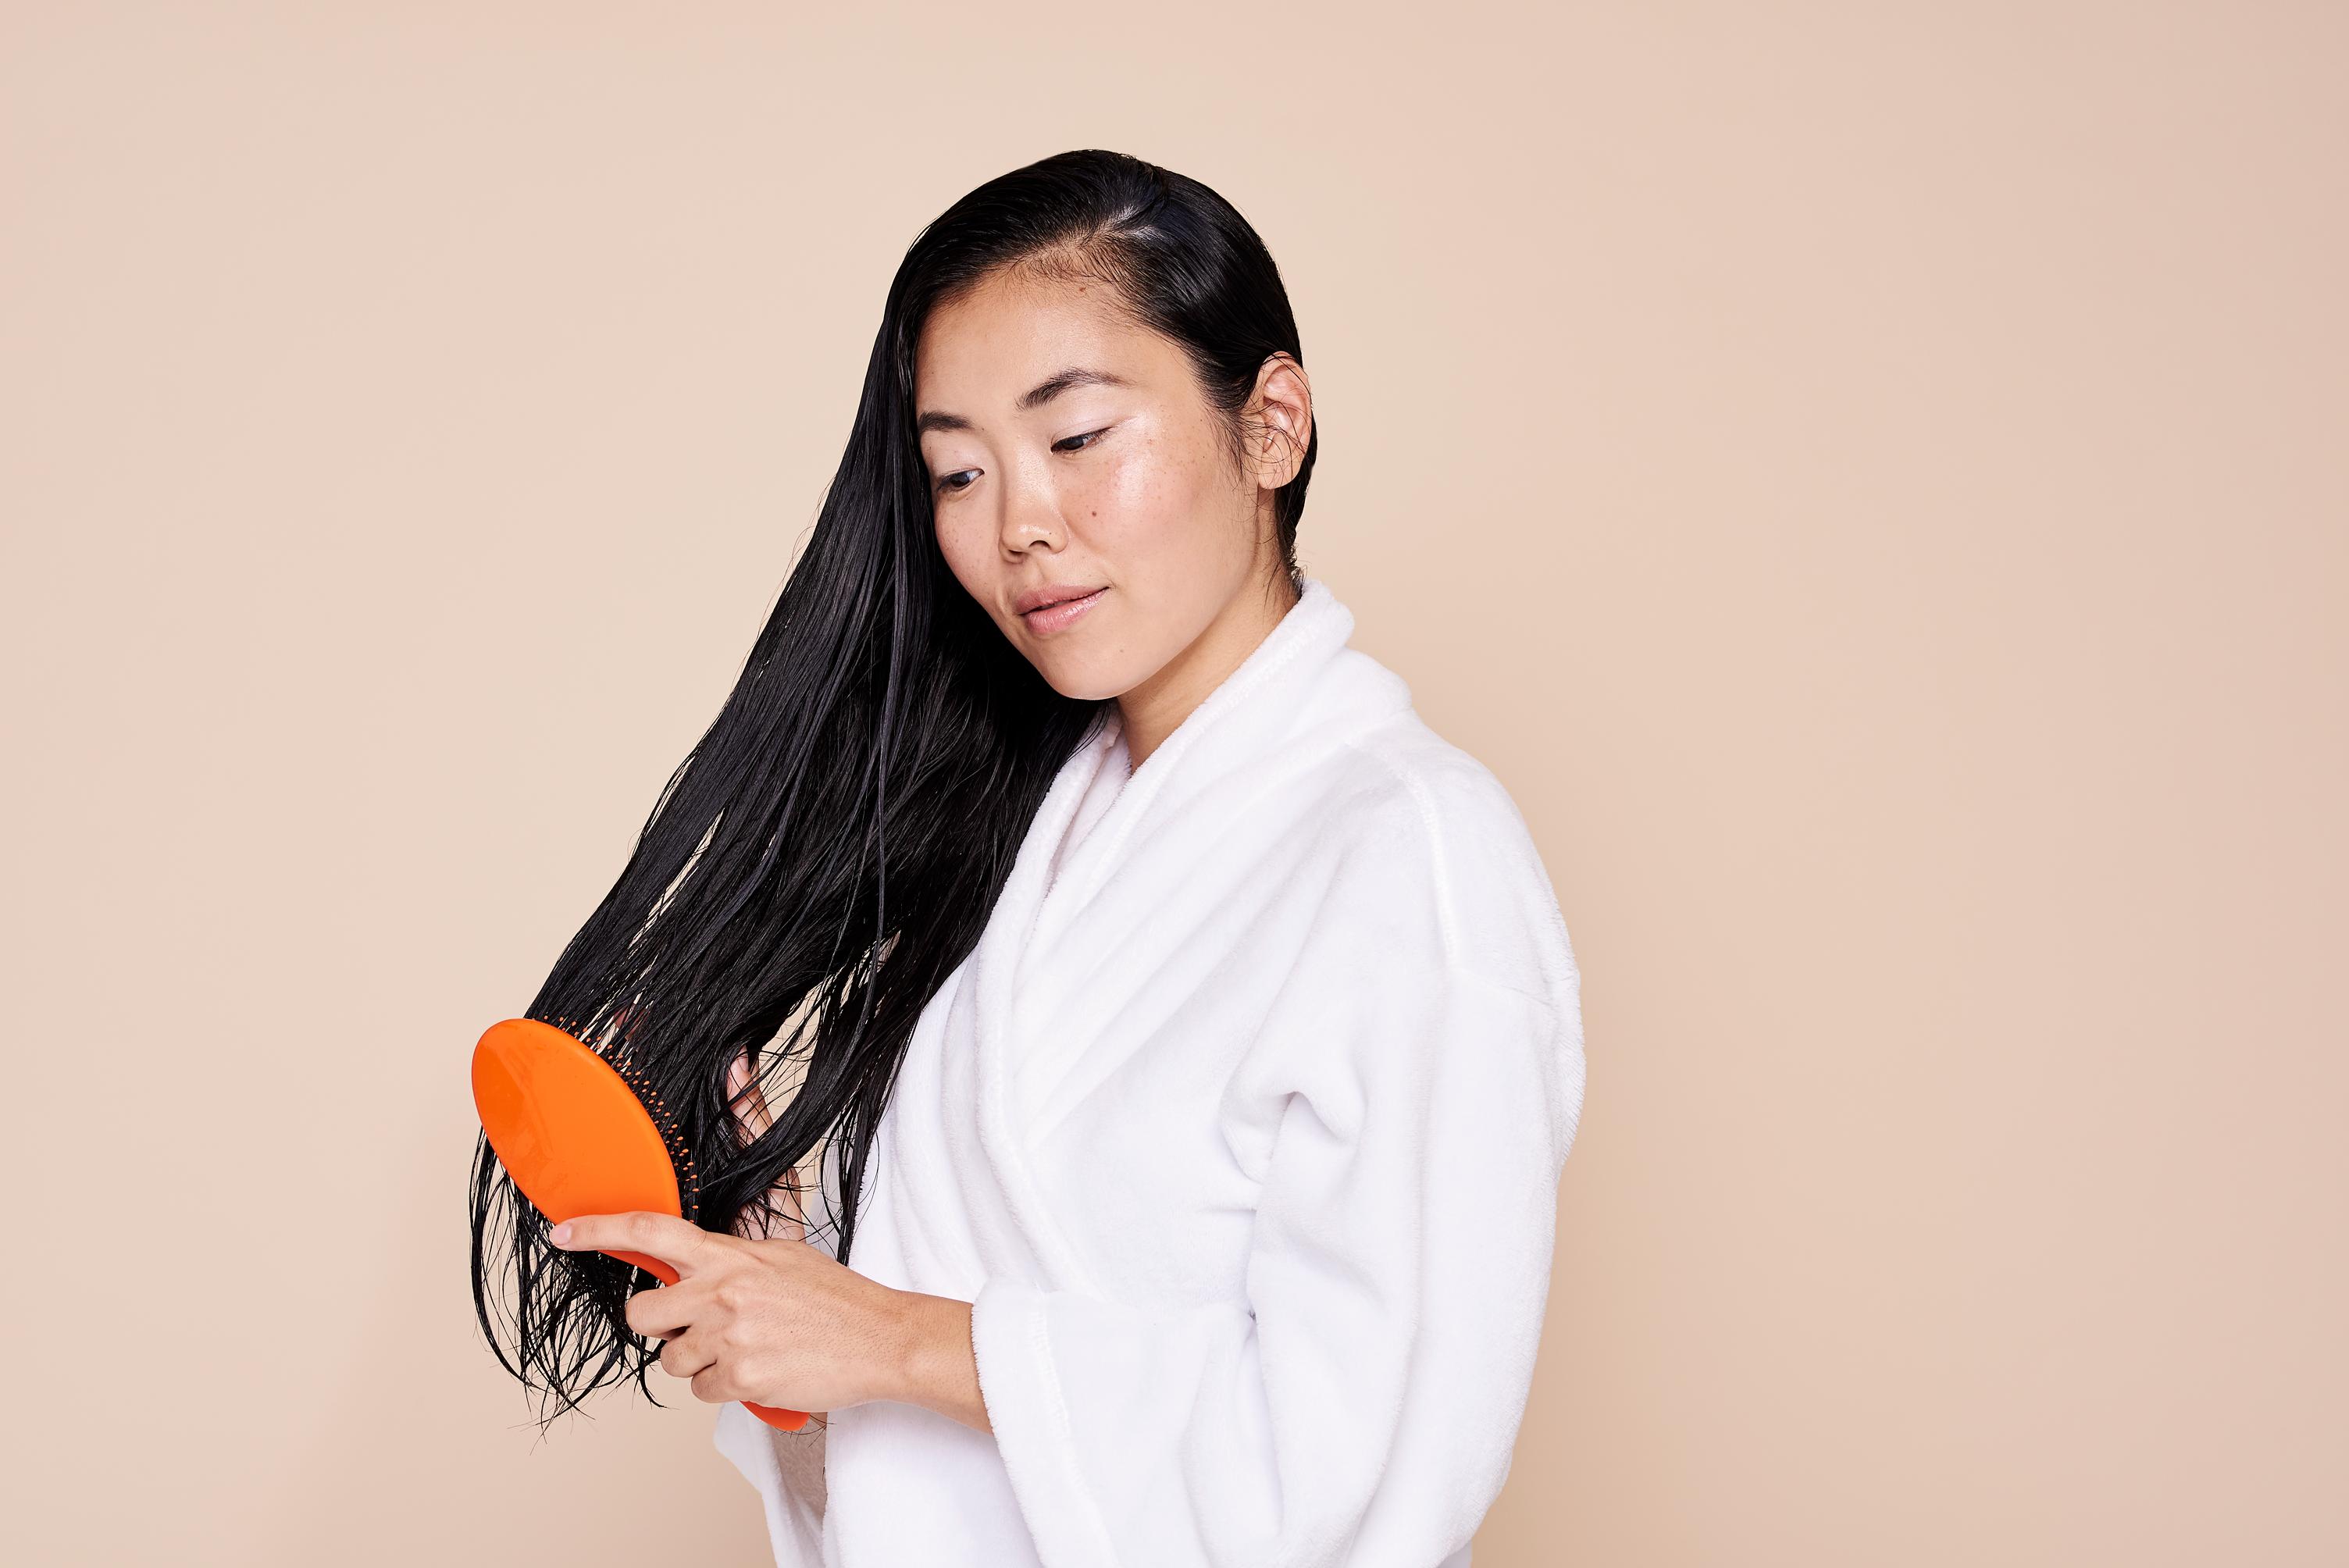 Tara Brand Hair Care Campaign ign